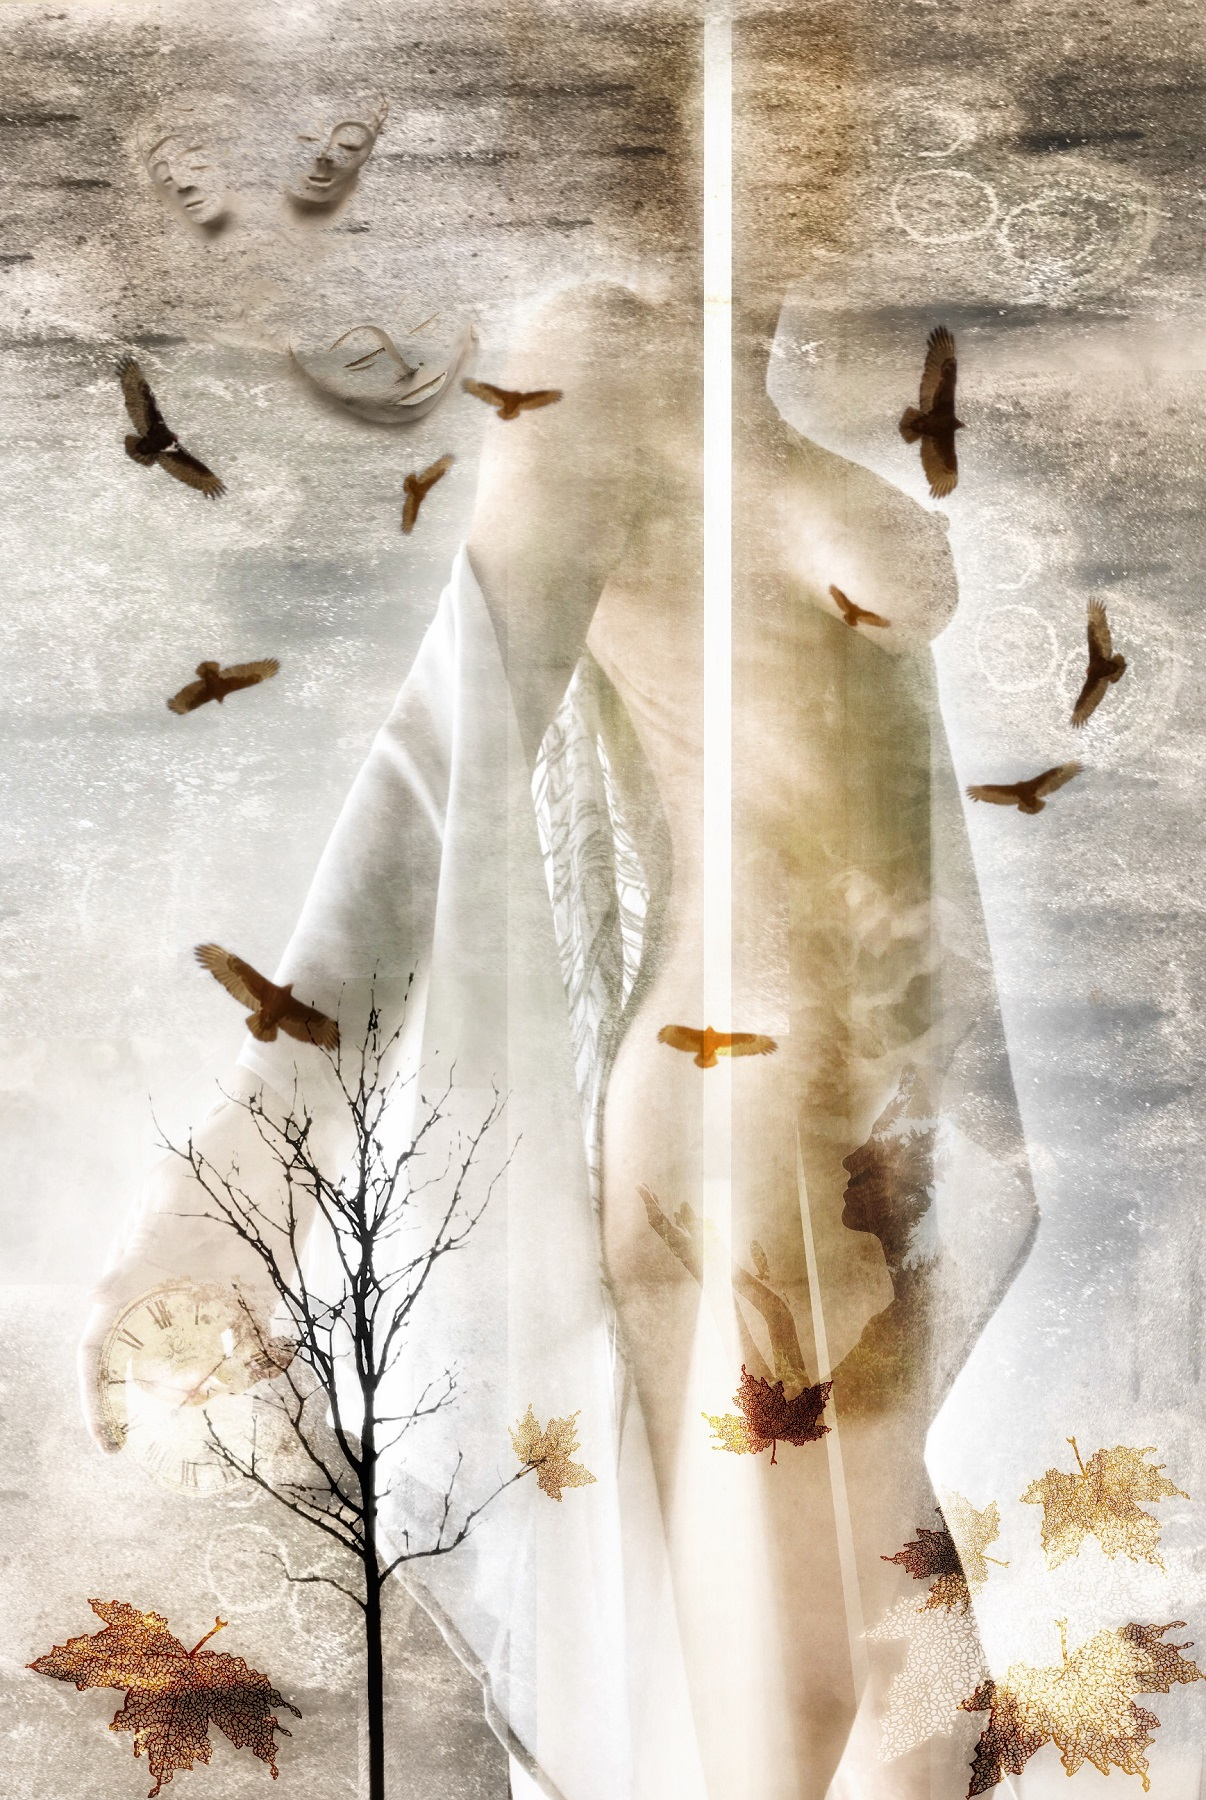 Jana_Curcio_Four Seasons_Fall_3.jpg